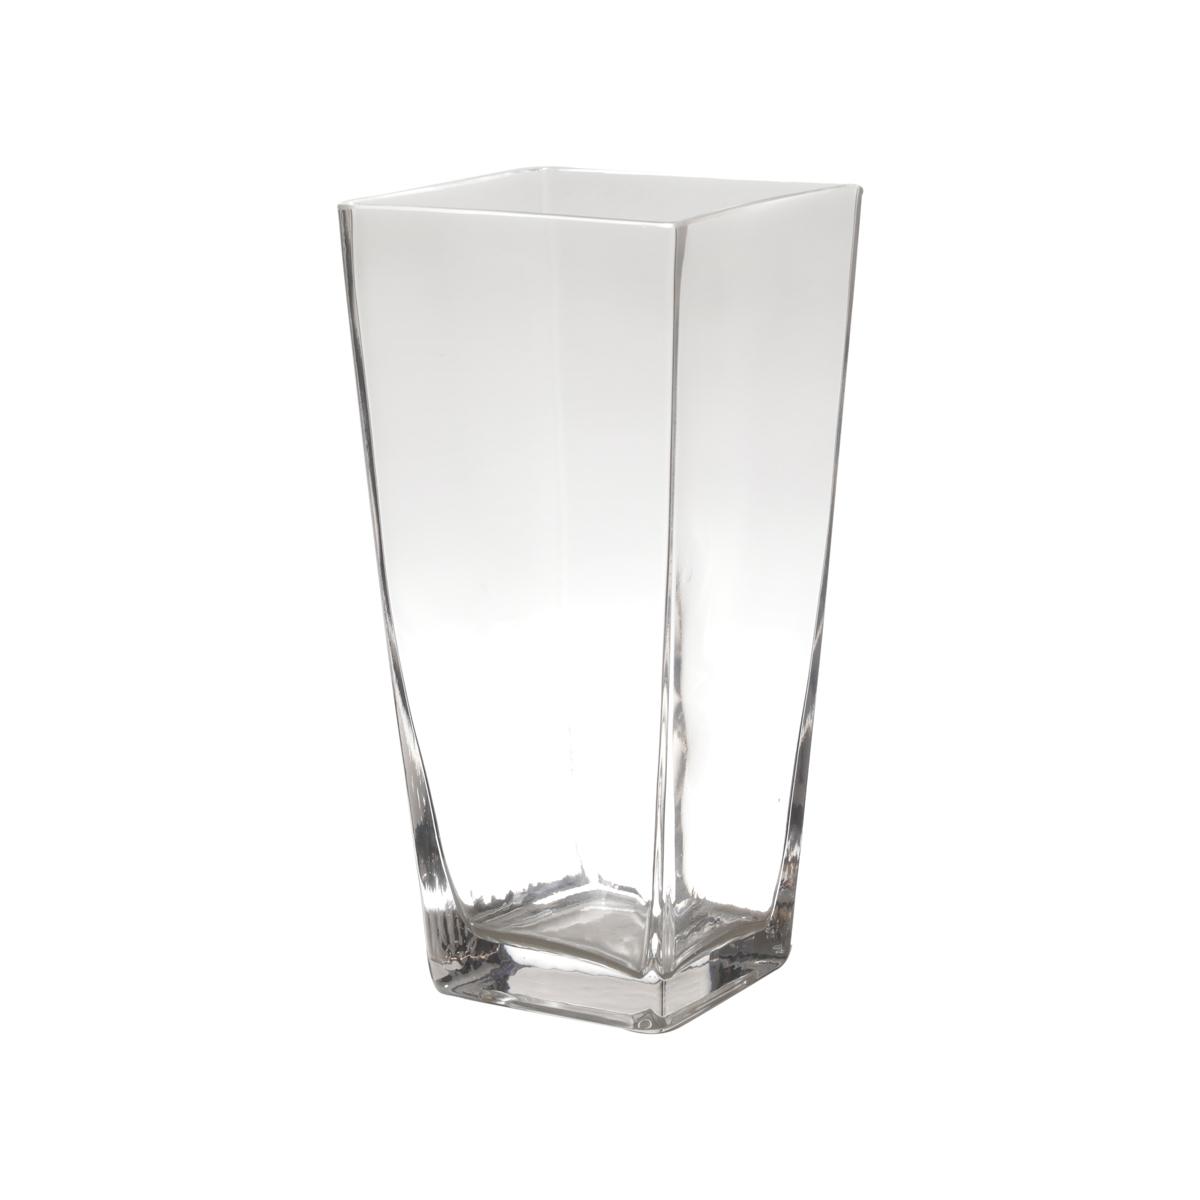 Vaso vidro Basic Clear Open Square 12x12x19 cm Urban